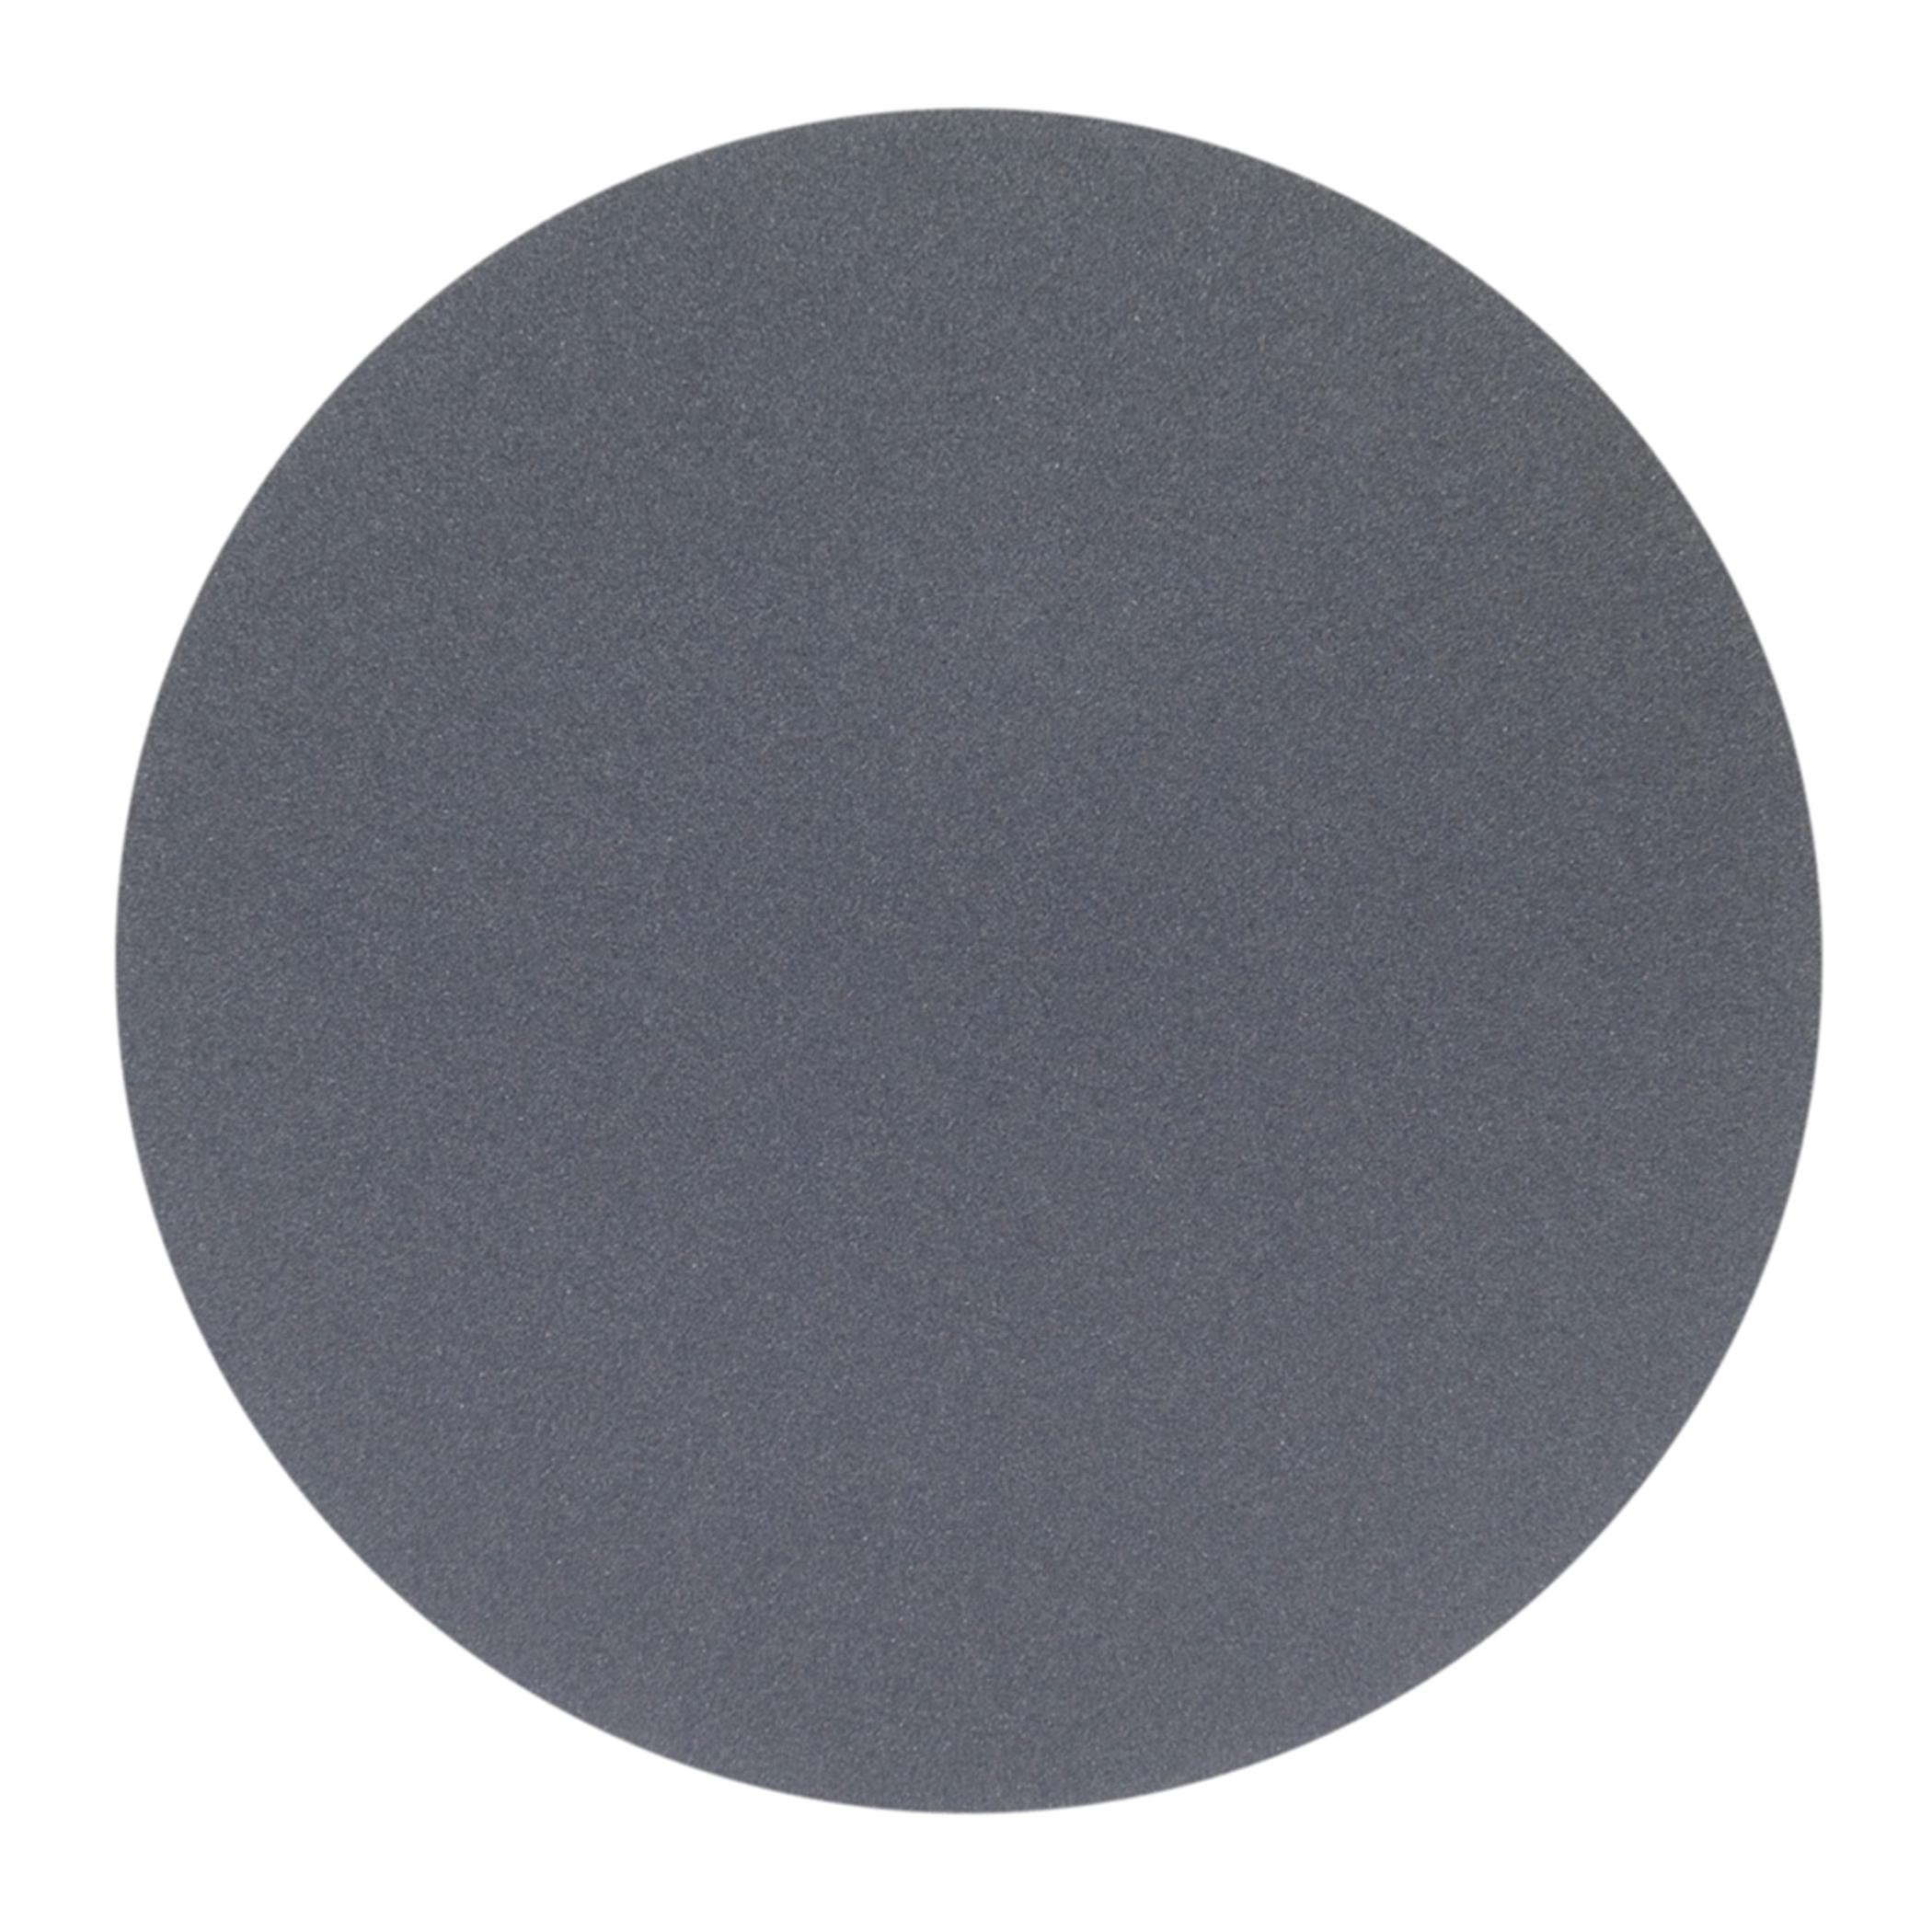 Norton® TufBak® 66261133339 T461 Coated Abrasive Disc, 12 in Dia, 320 Grit, Extra Fine Grade, Silicon Carbide Abrasive, Paper Backing